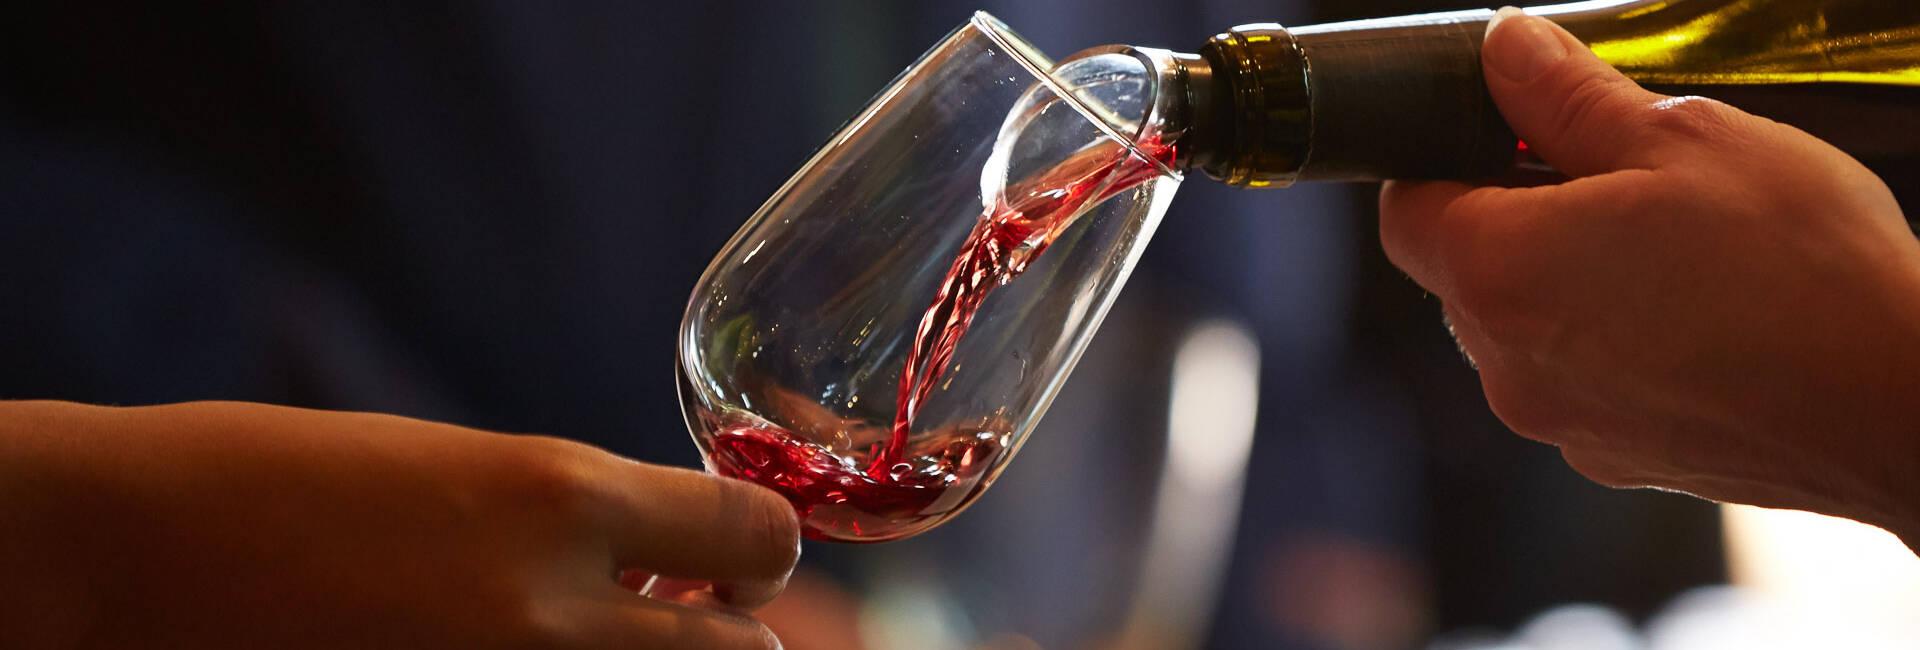 Wine Tasting in Beaune, Meursault, Chagny, Nolay, Santenay, Savigny-les-Beaune © Studio Piffaut